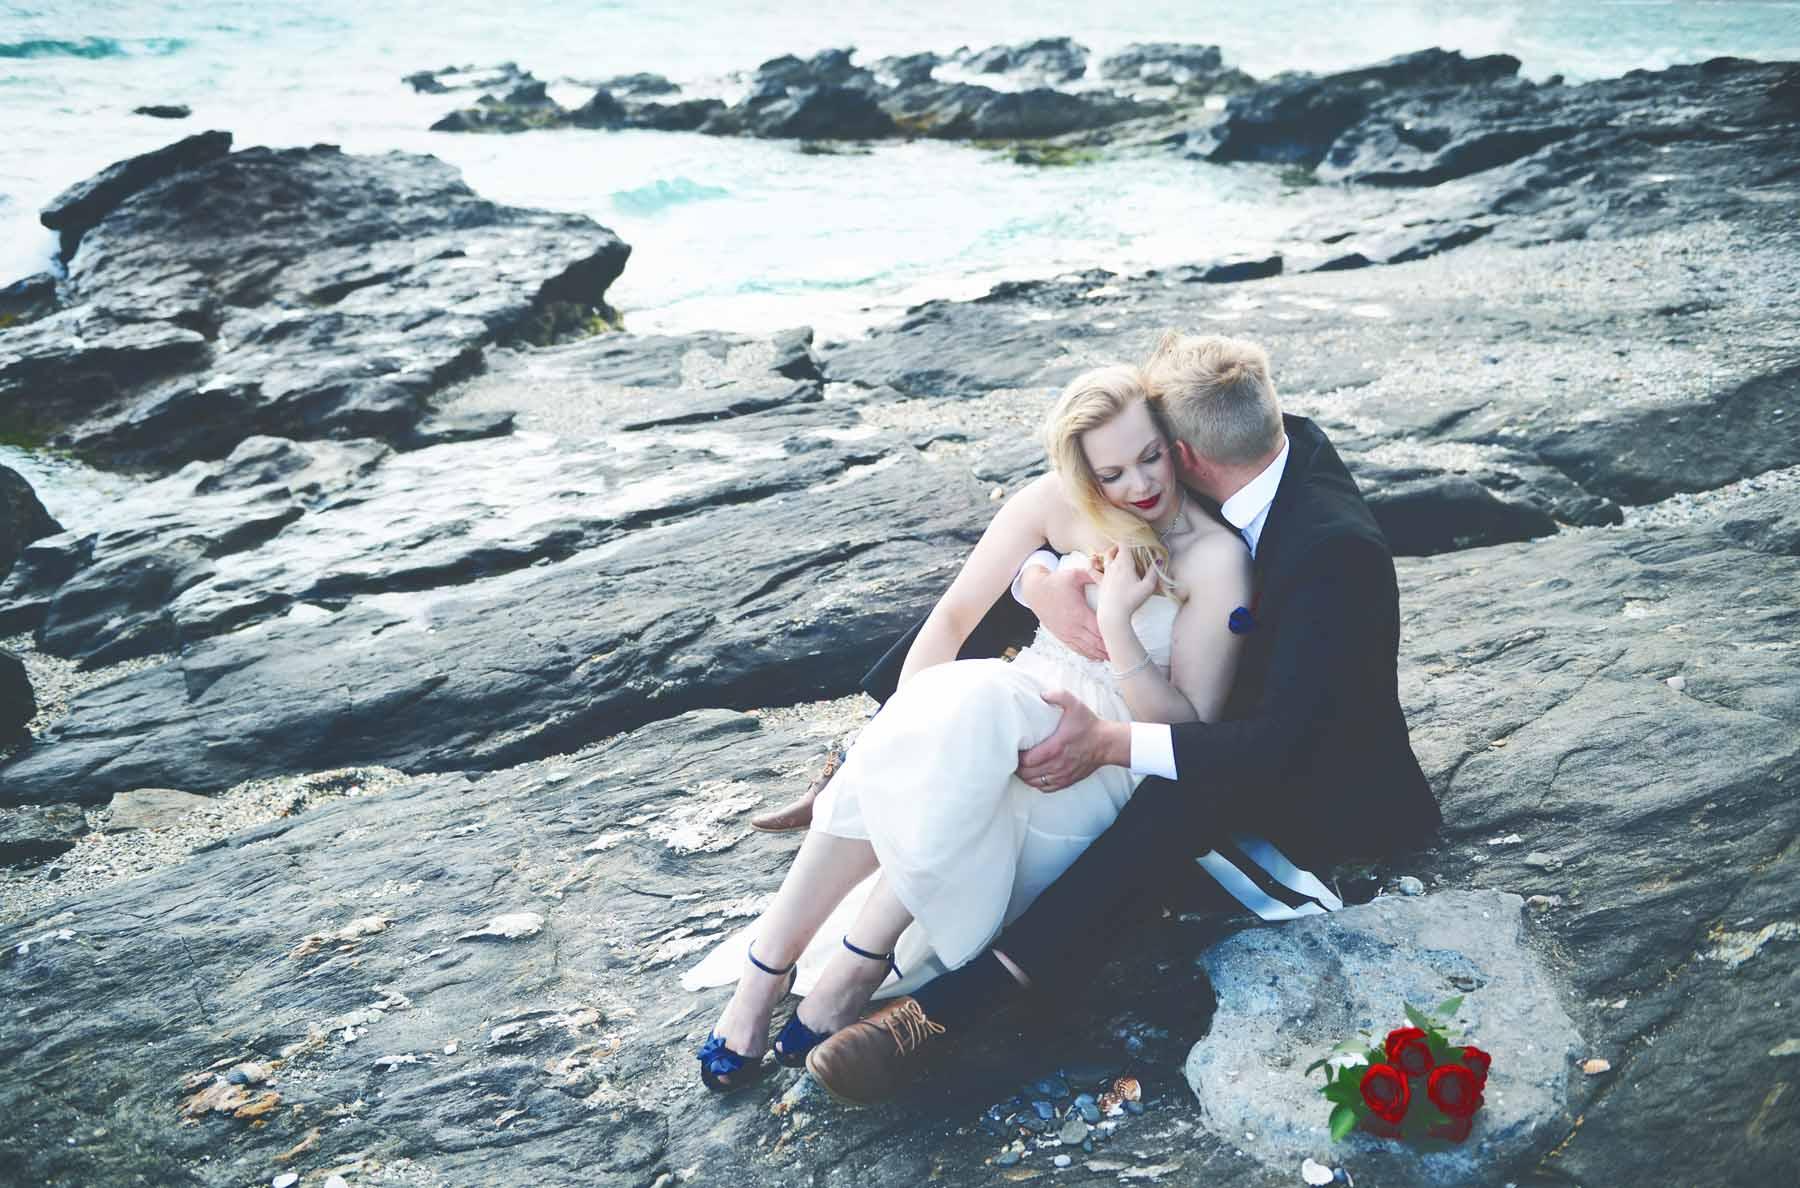 marbella fotografias artistica de boda